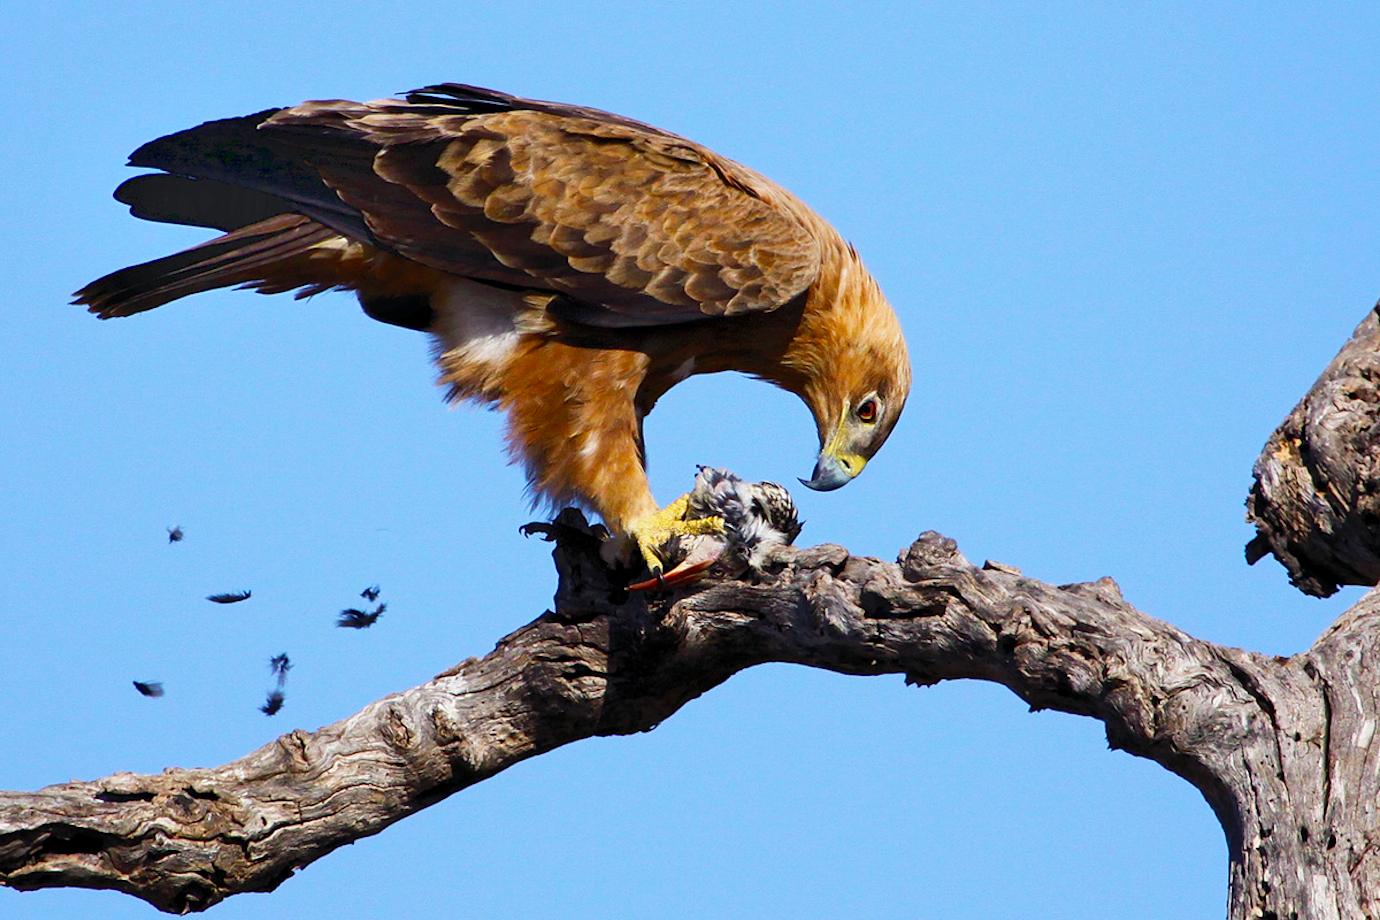 Peter-Pischler-Tawny-Eagle-with-Hornbill